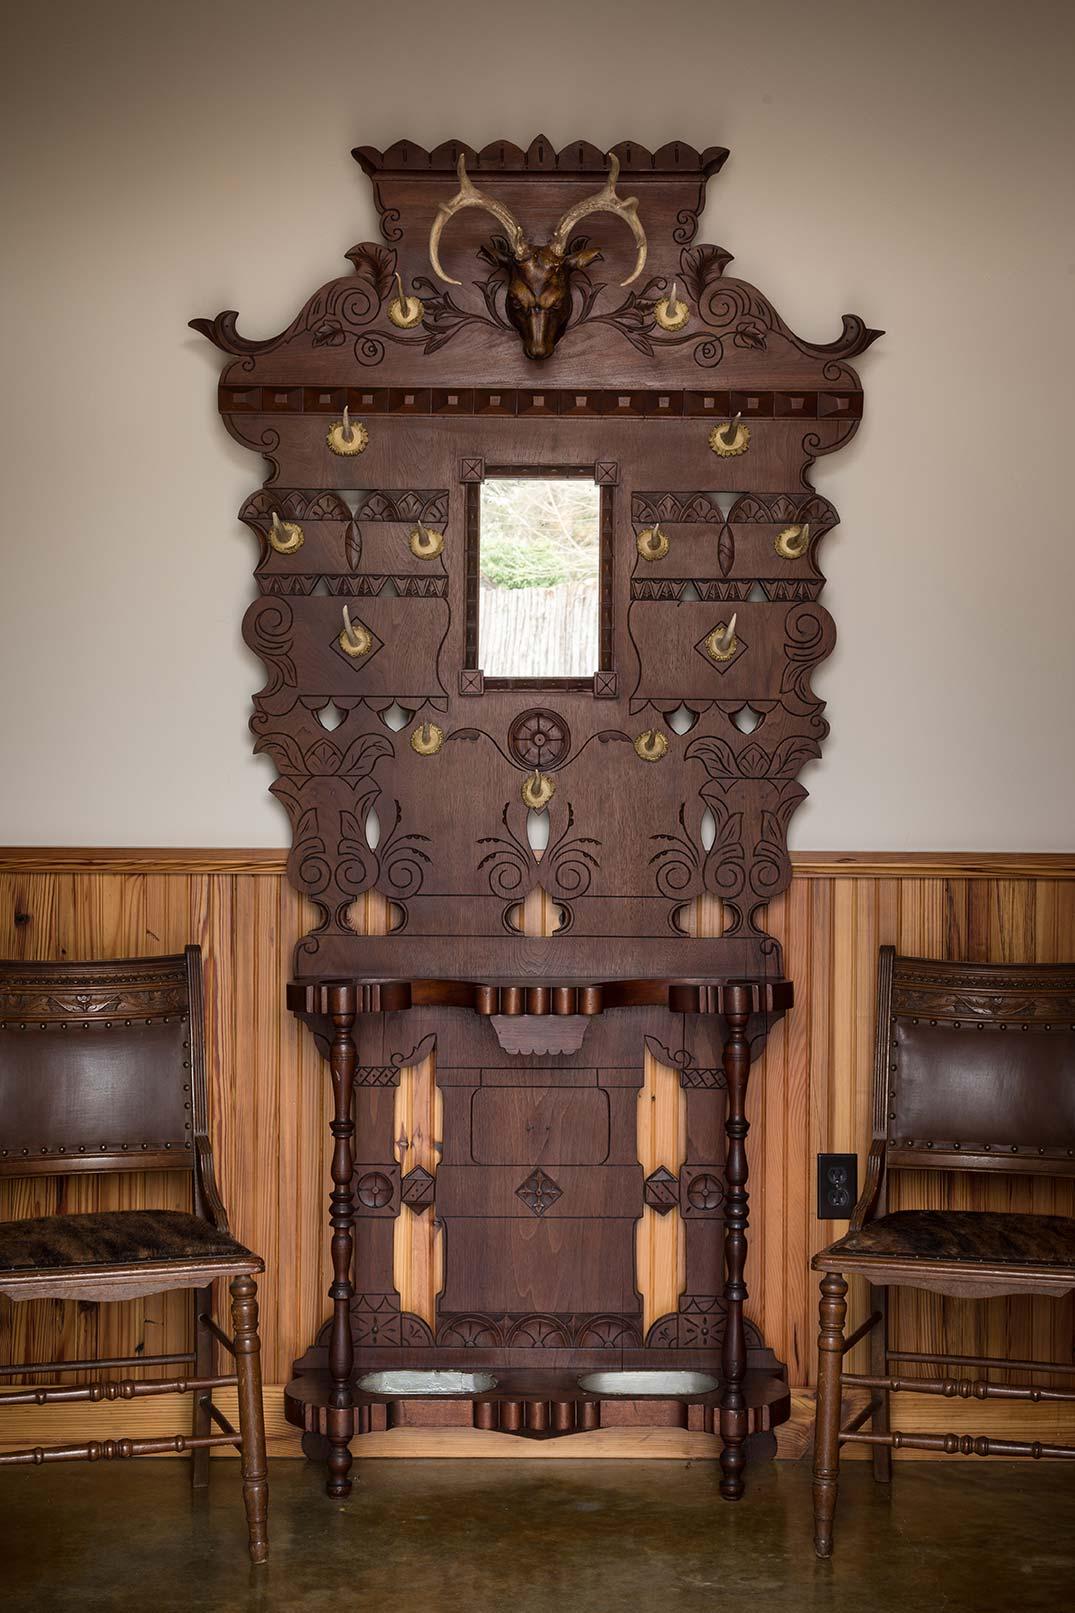 blacksmith-quarters-fredericksburg-realty-texas-commercial-real-estate-for-sale-antique-historic-town.jpg